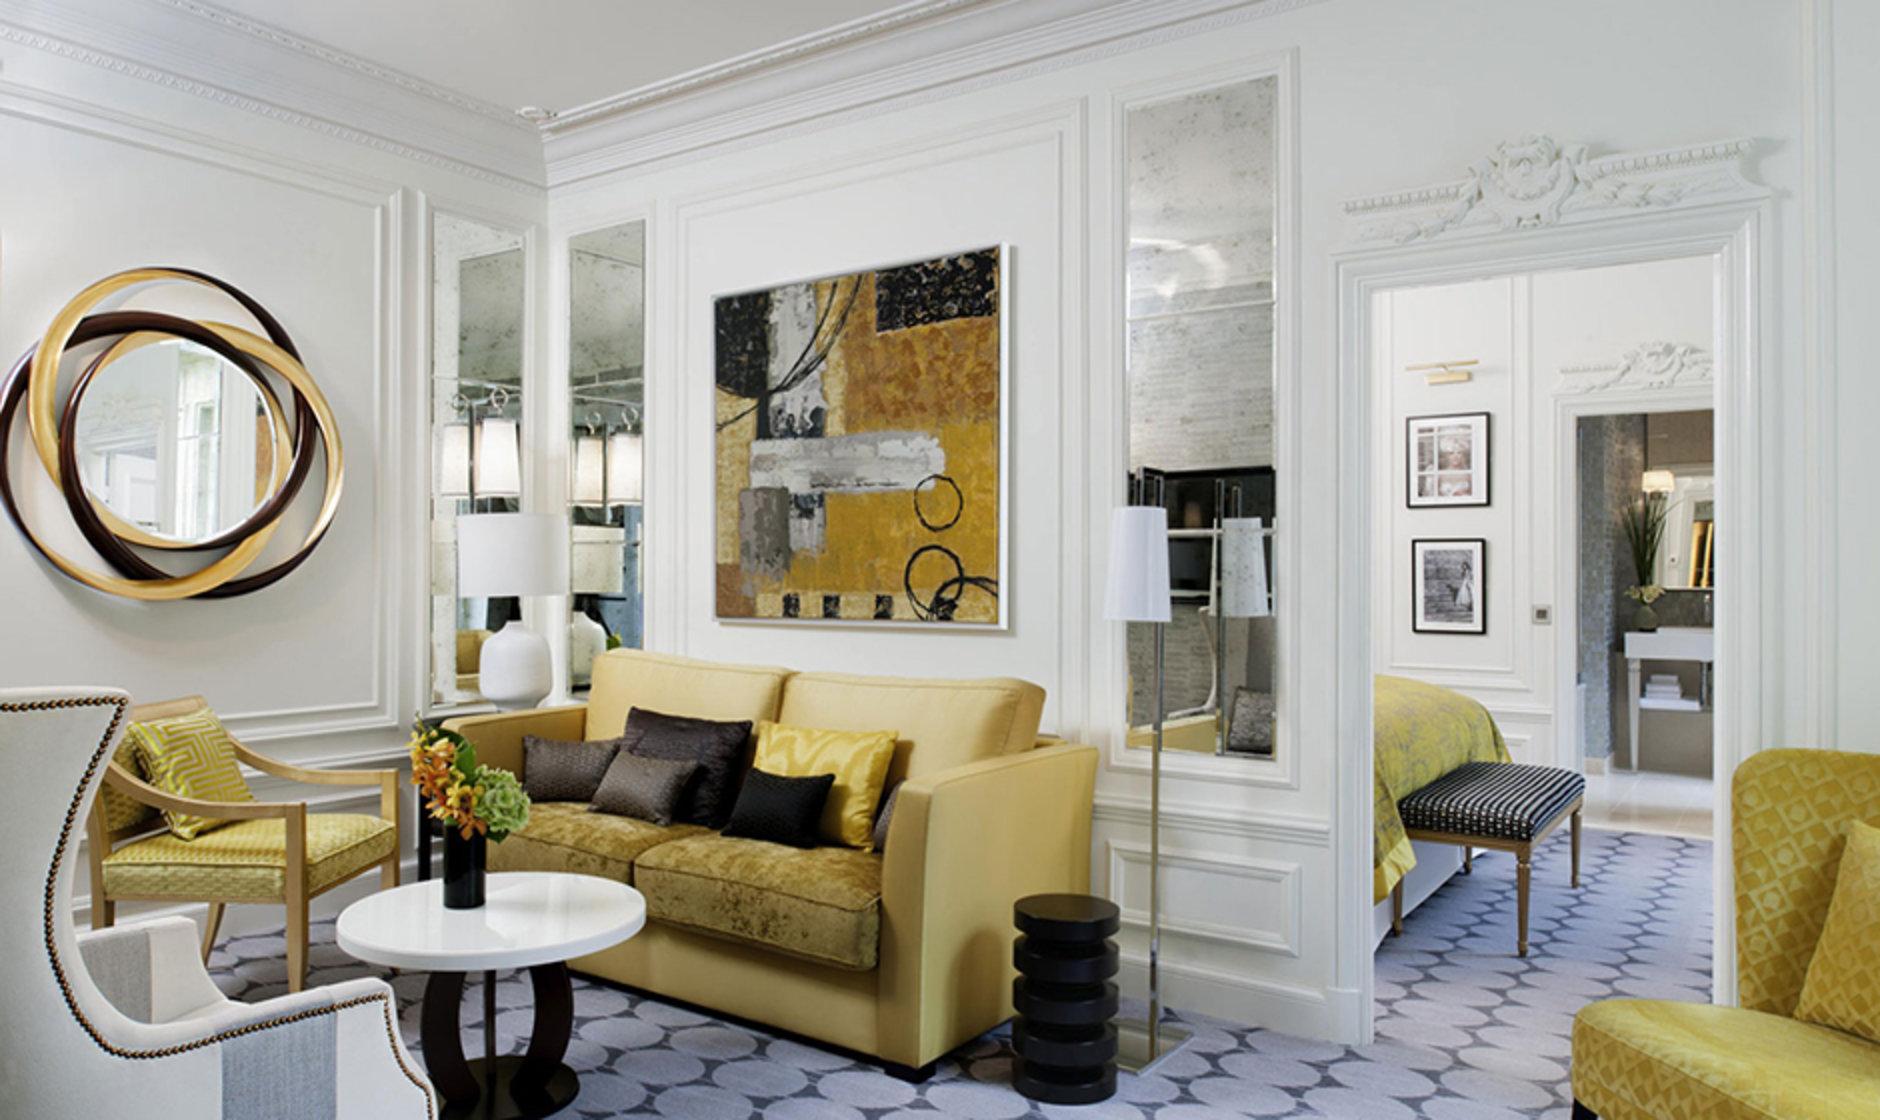 csm_Sofitel-Paris-Le-Faubourg-Hotel-Suite1_68ef2dafcd